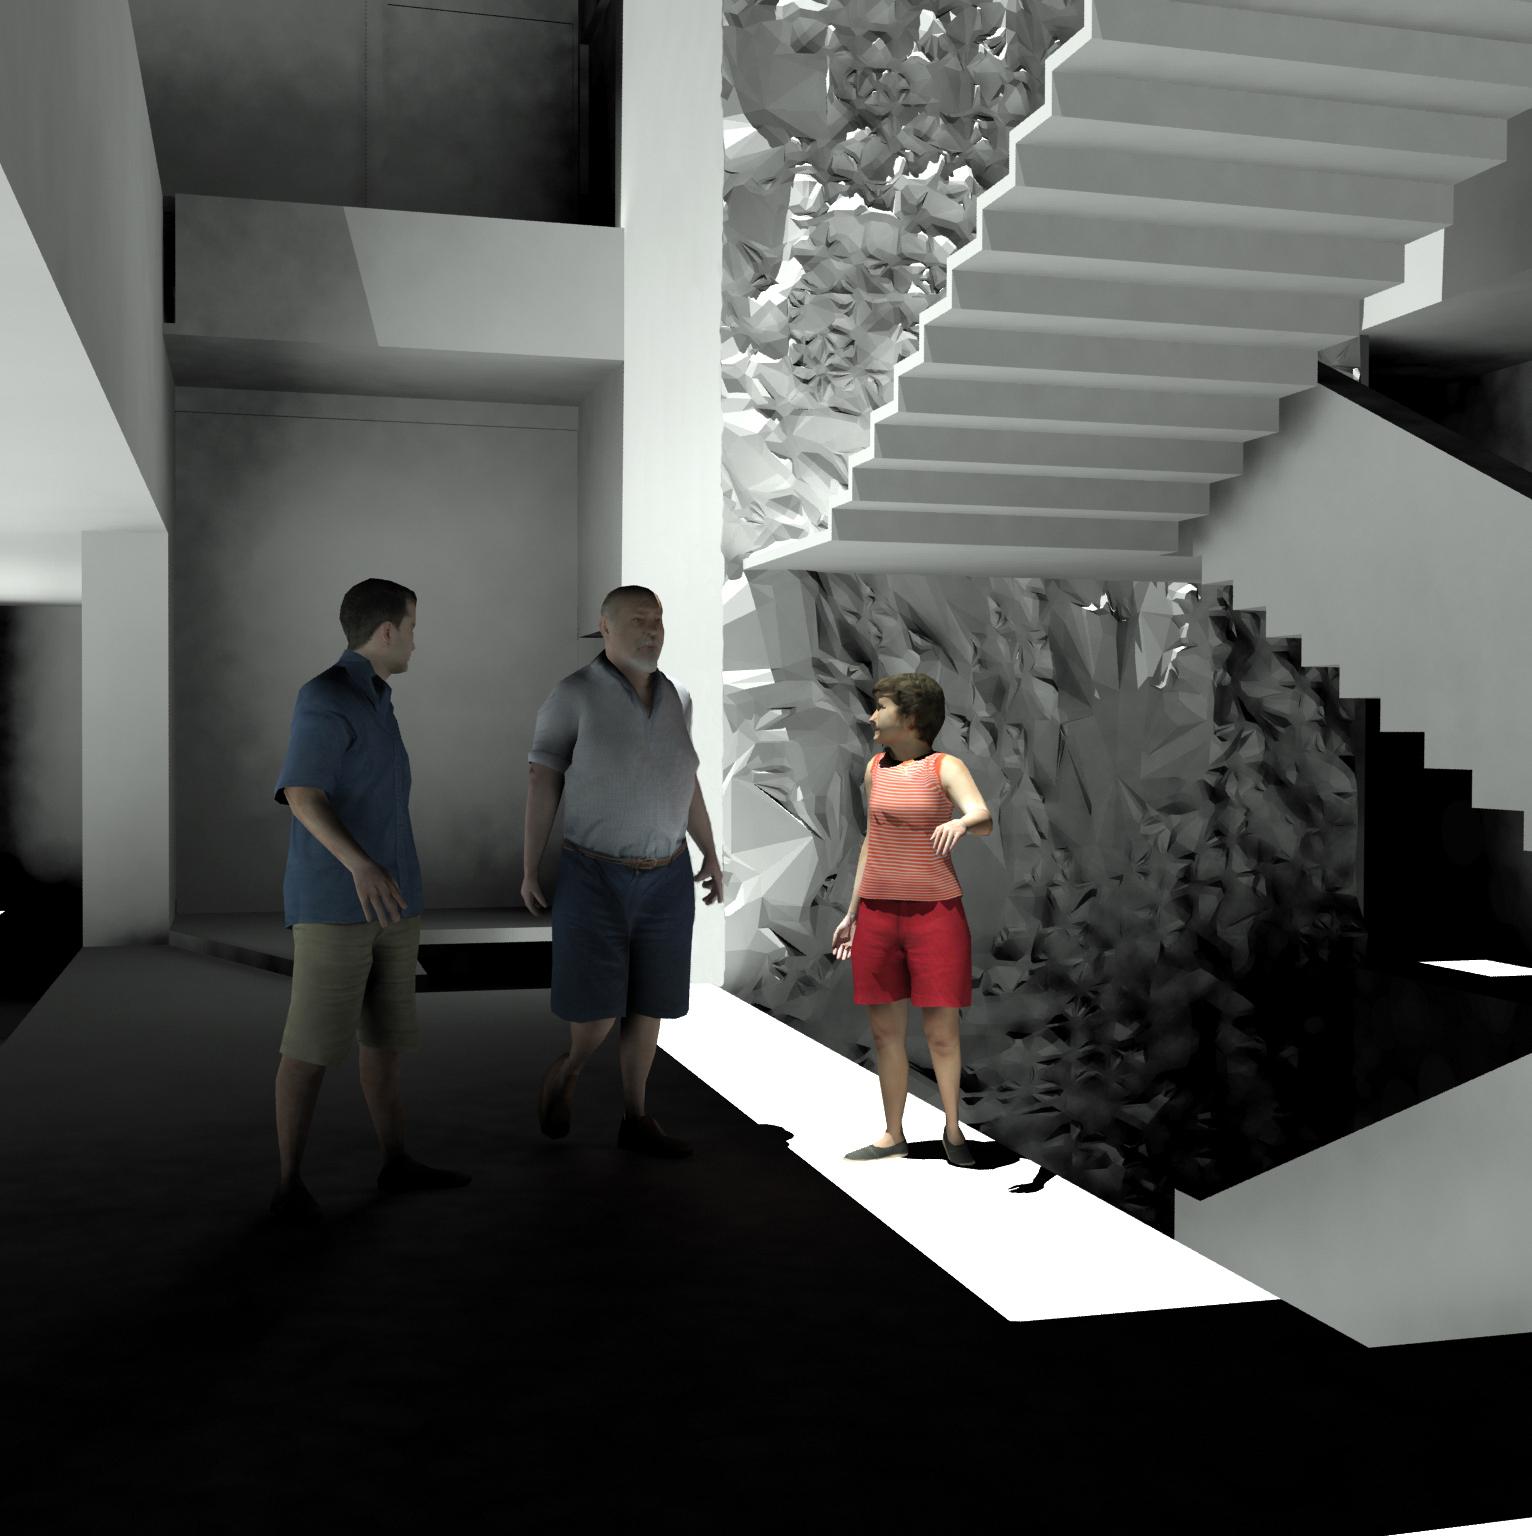 44-trappe2.jpg